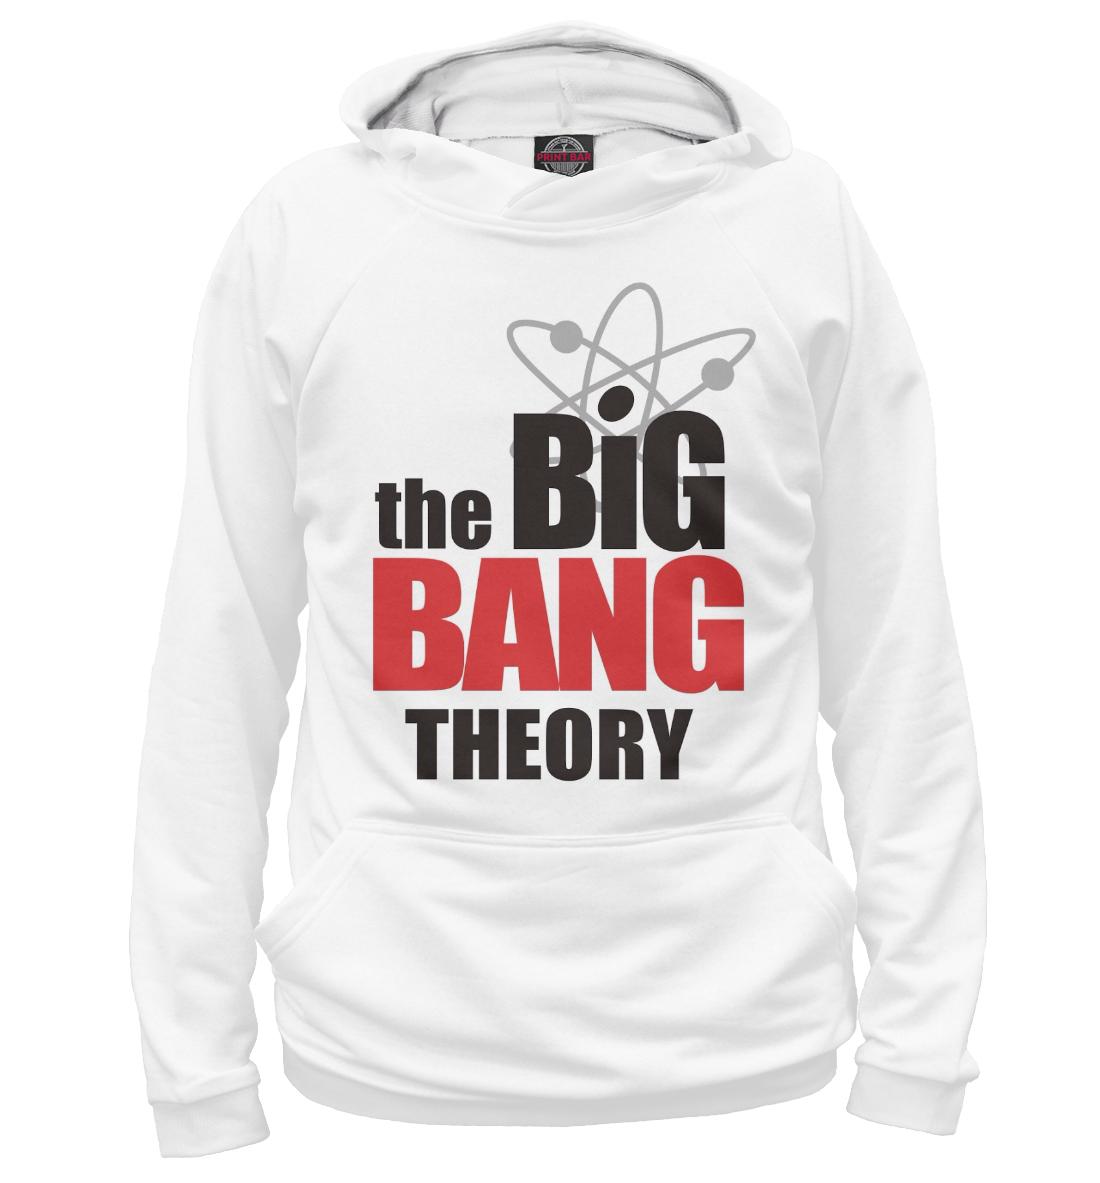 Купить The Big Bang Theory, Printbar, Худи, TEO-602107-hud-1